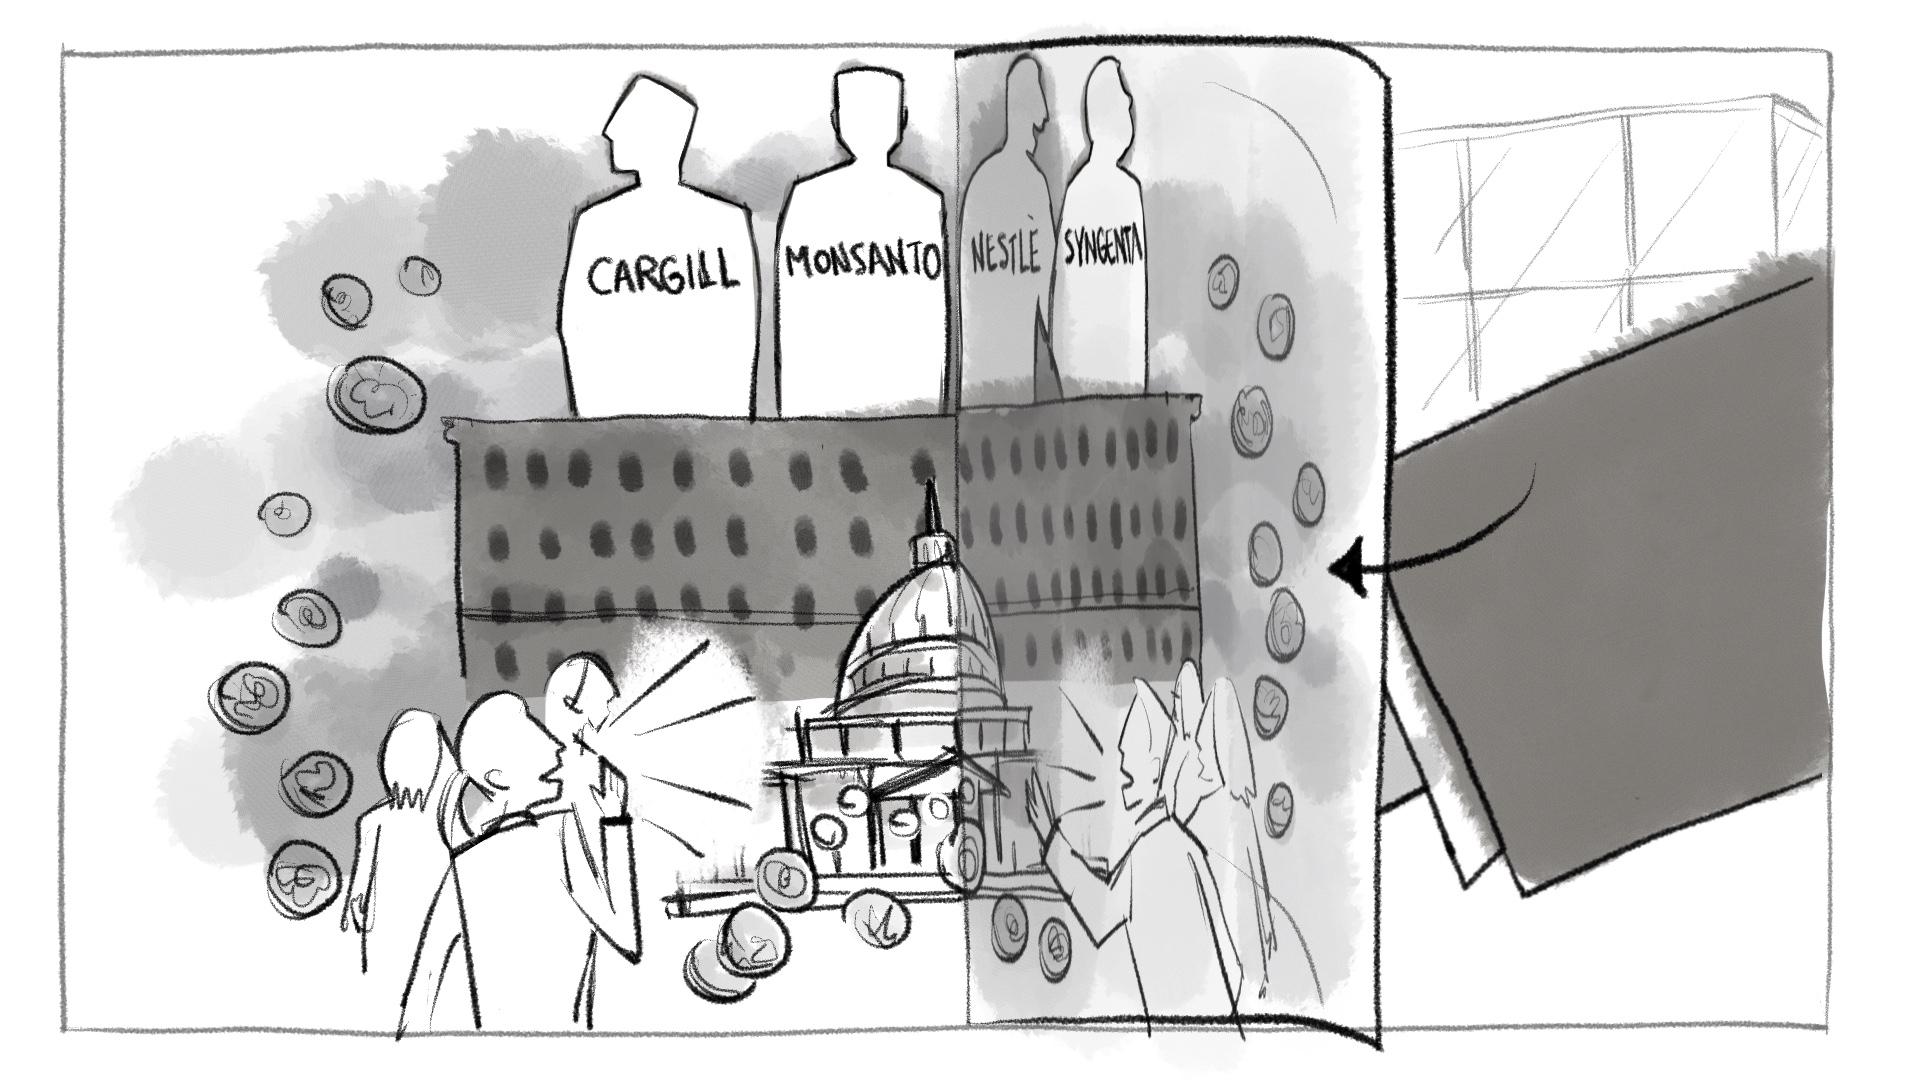 Shahidi_Storyboards_4c-1.jpg